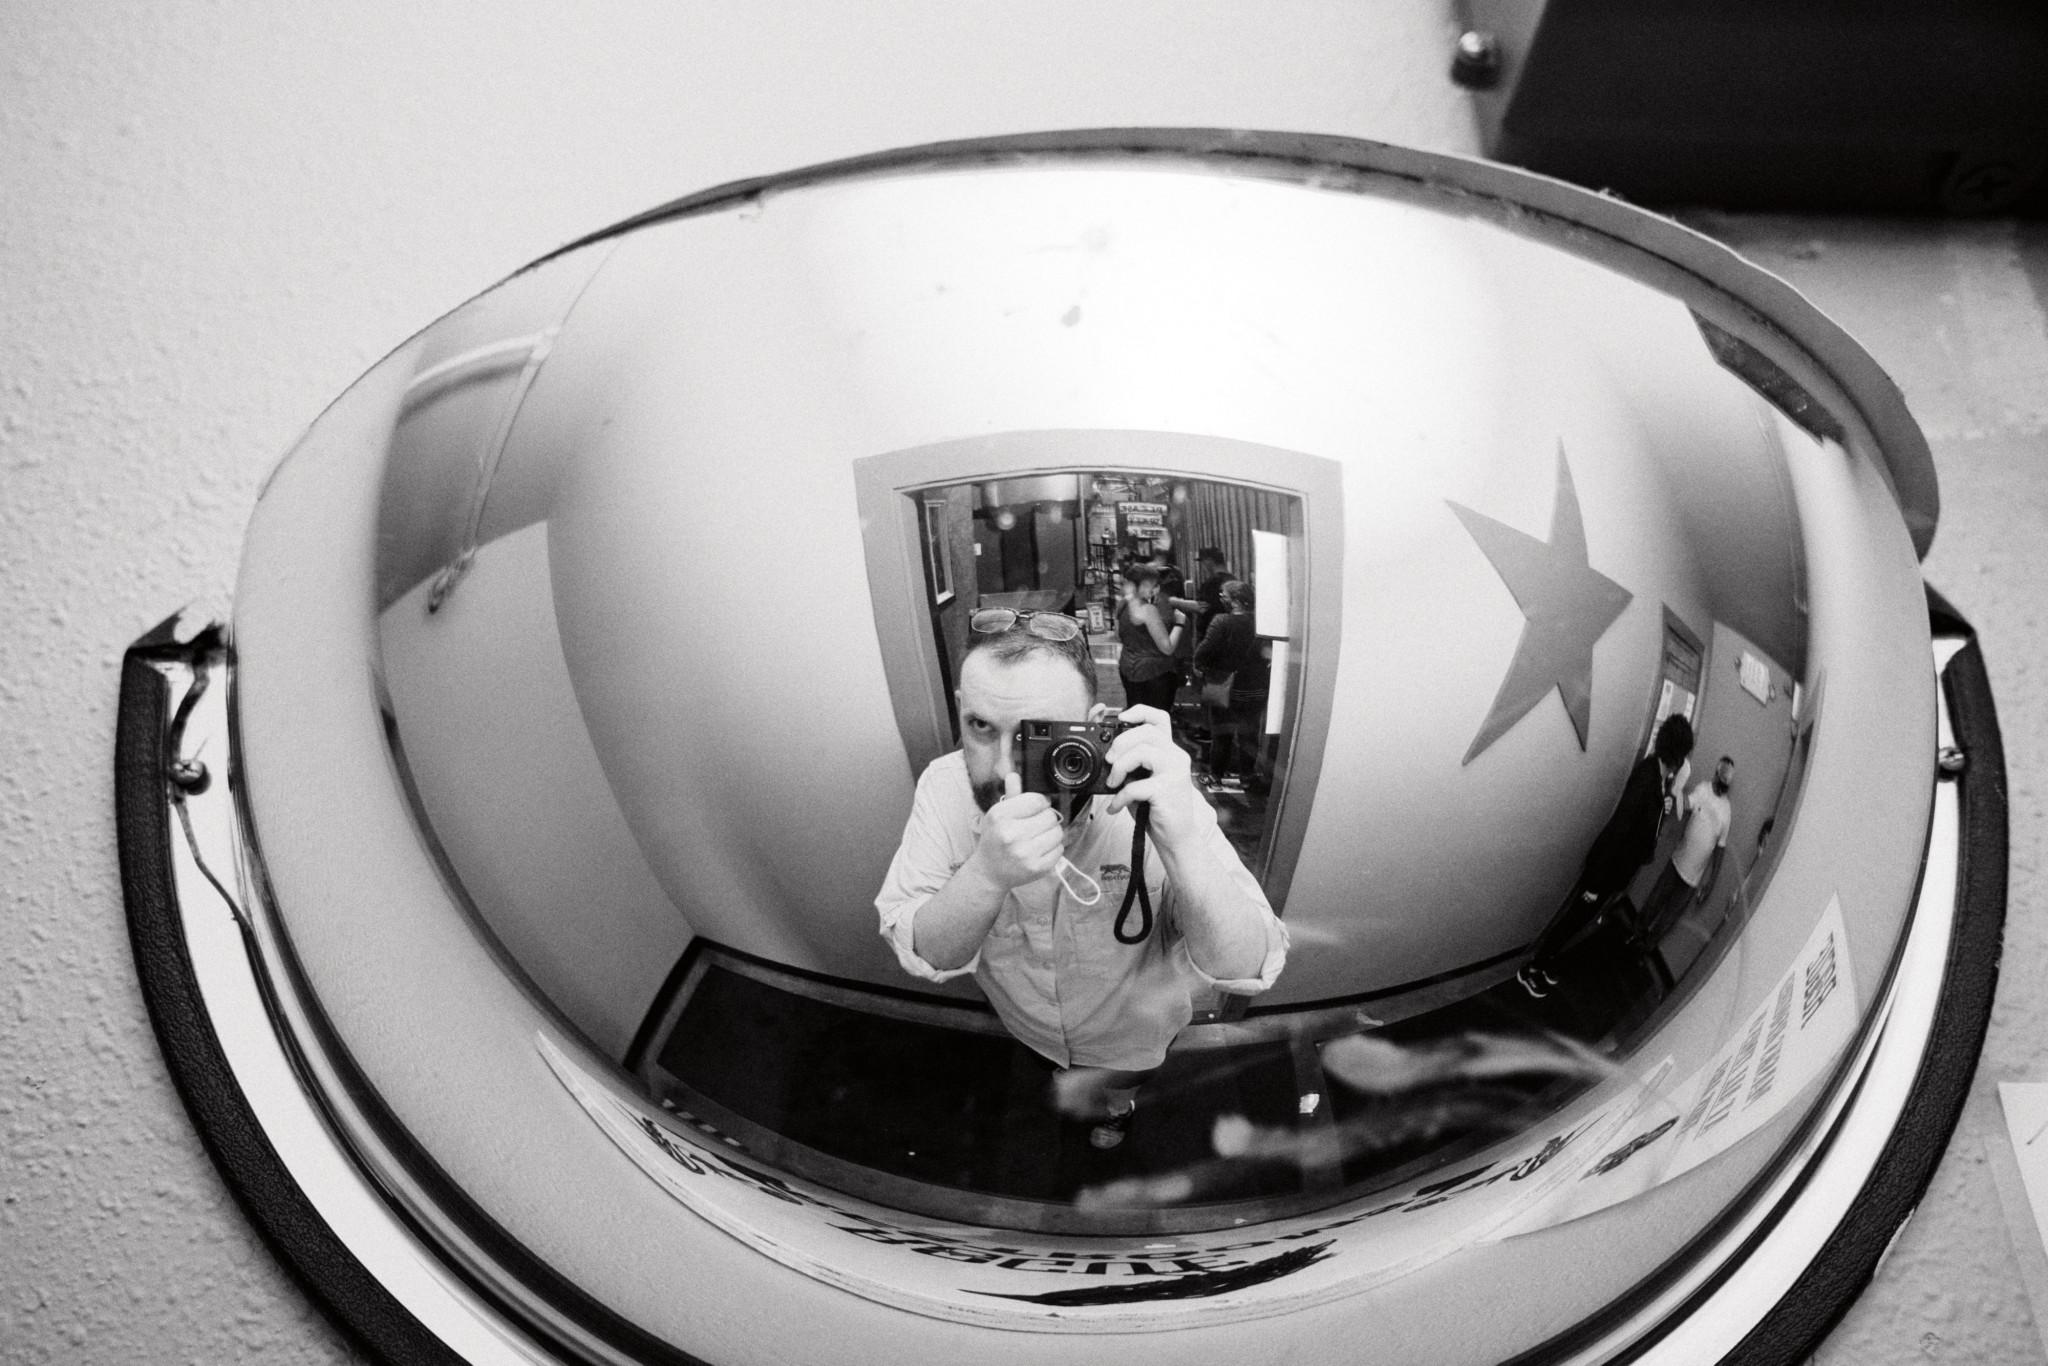 Rogue-Mirror-Shot-2021.jpg